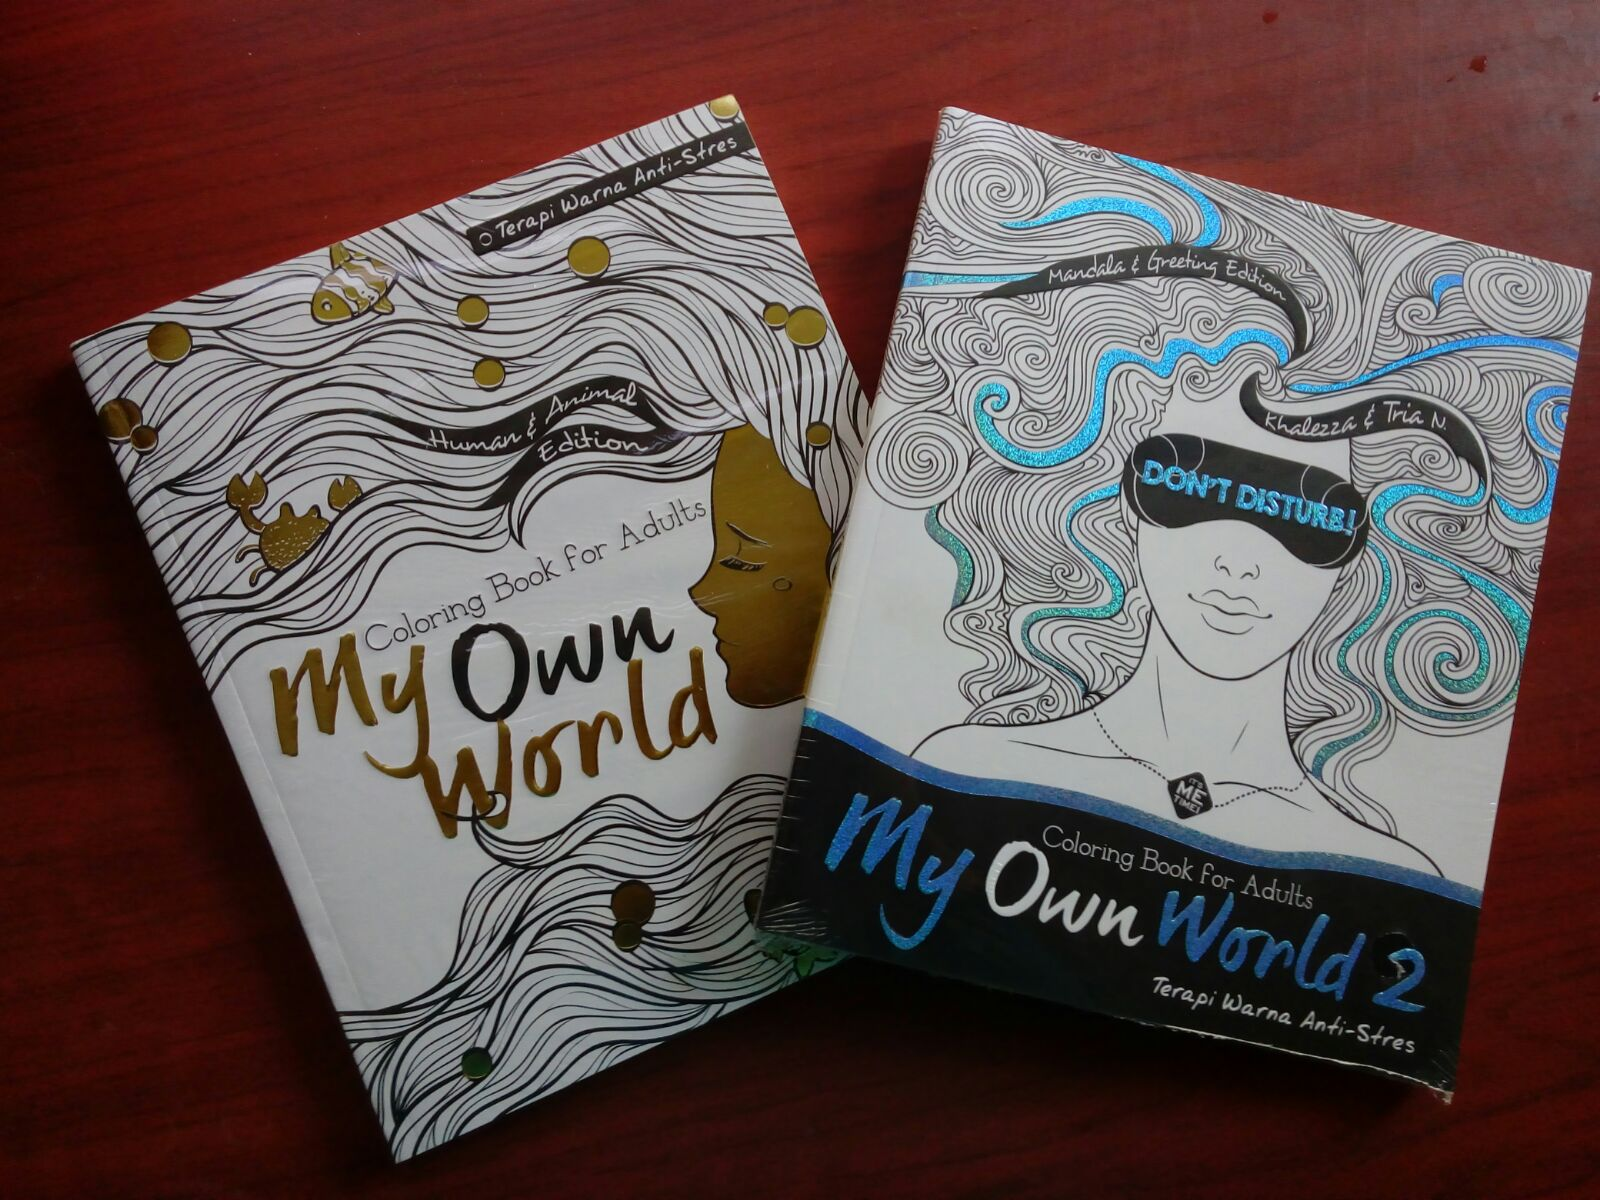 Jual Paket My Own World Coloring Book For Adults 1 Dan 2